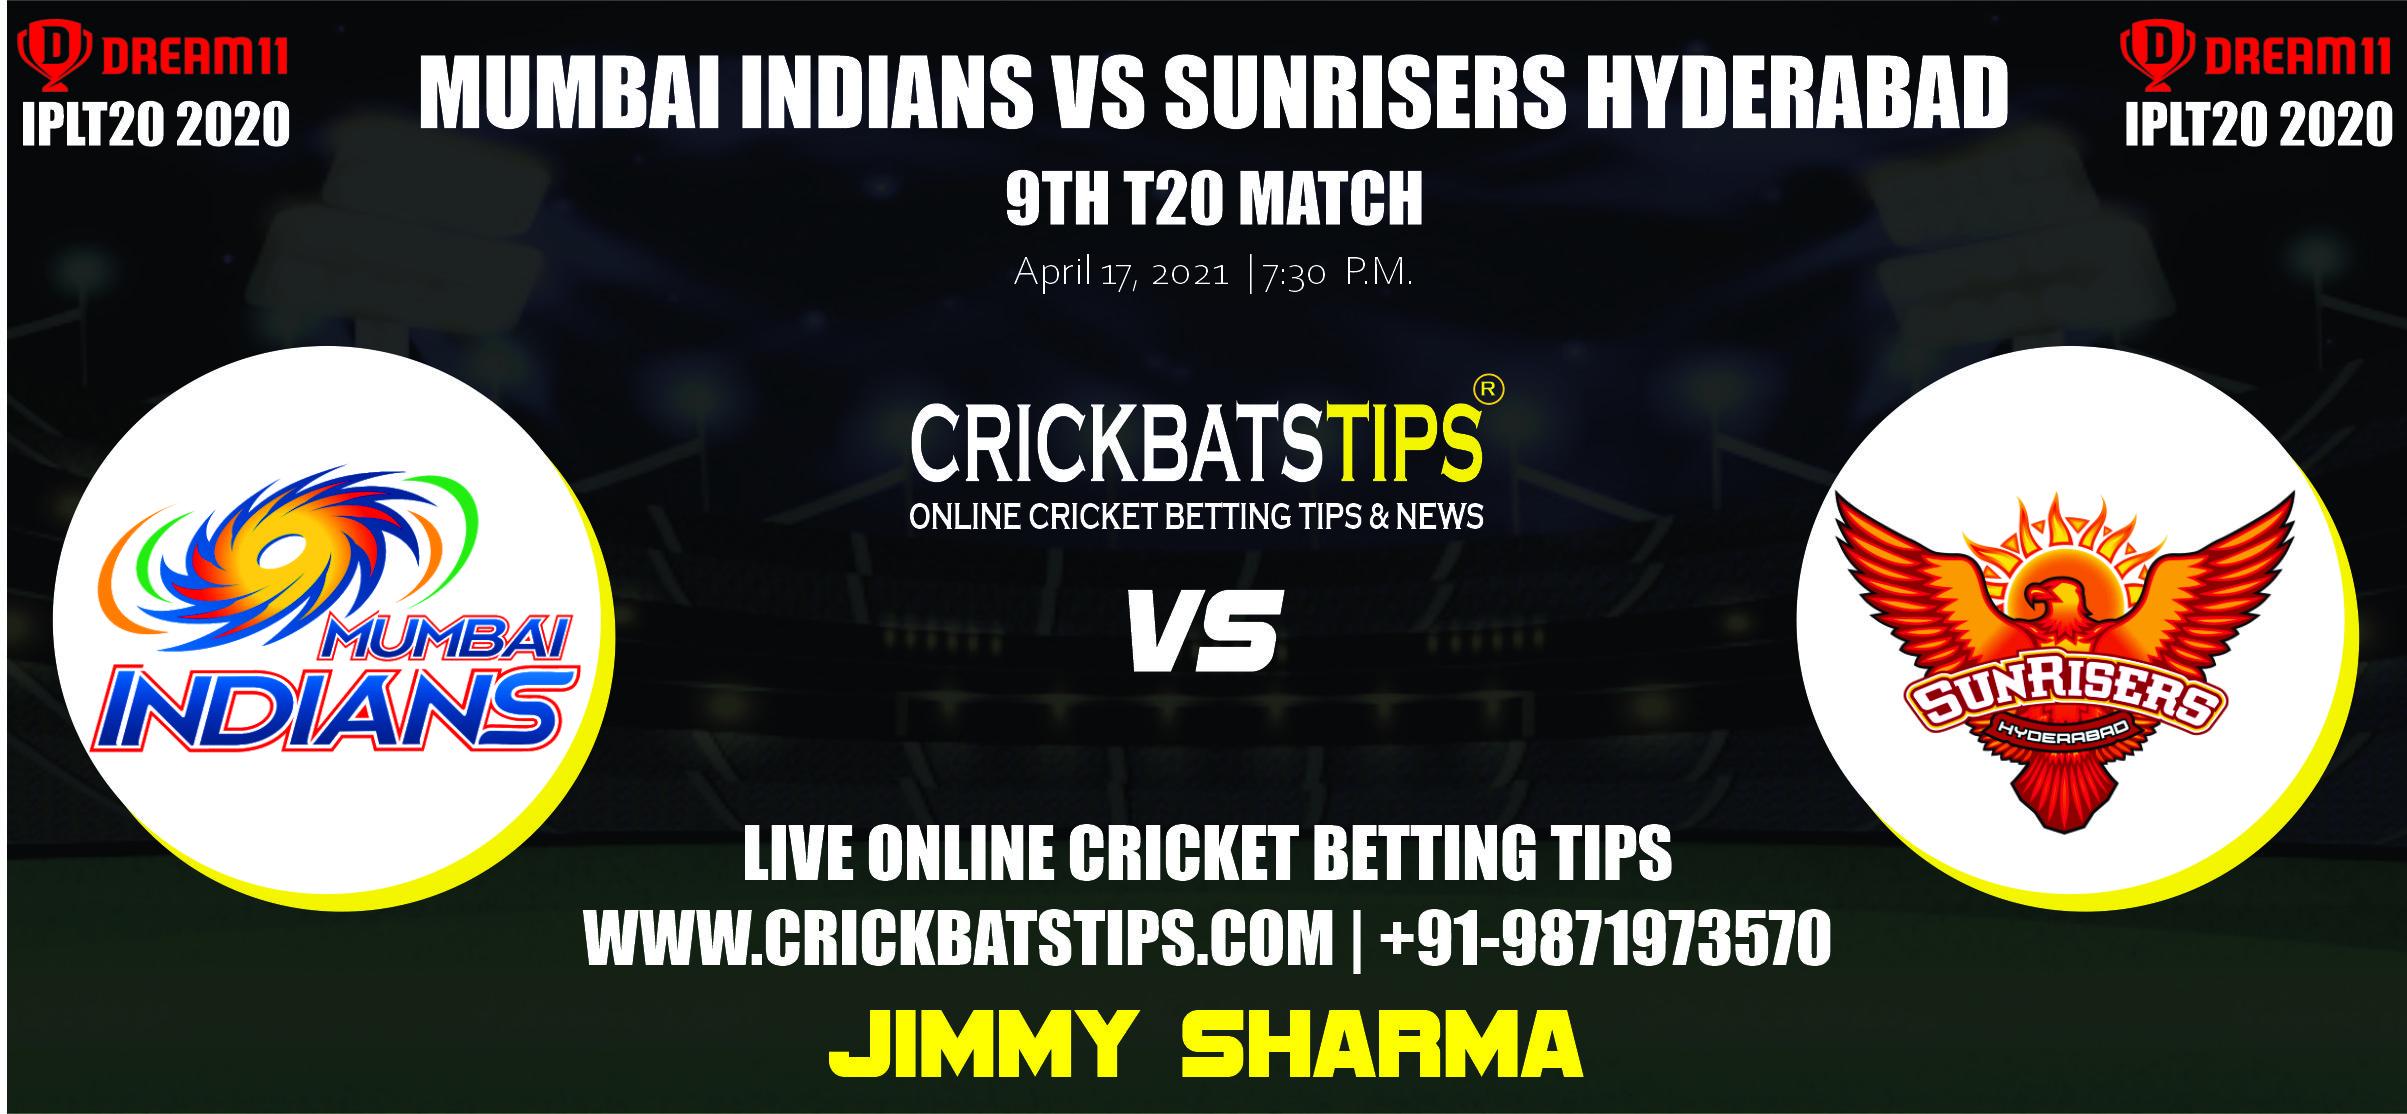 Mumbai-Indians-vs-Sunrisers-Hyderabad-MIvSRH-MIvsSRH-SRHvMI-SRHvsMI-Sunrisers-Hyderabad-vs-Mumbai-Indians-IPL-2021